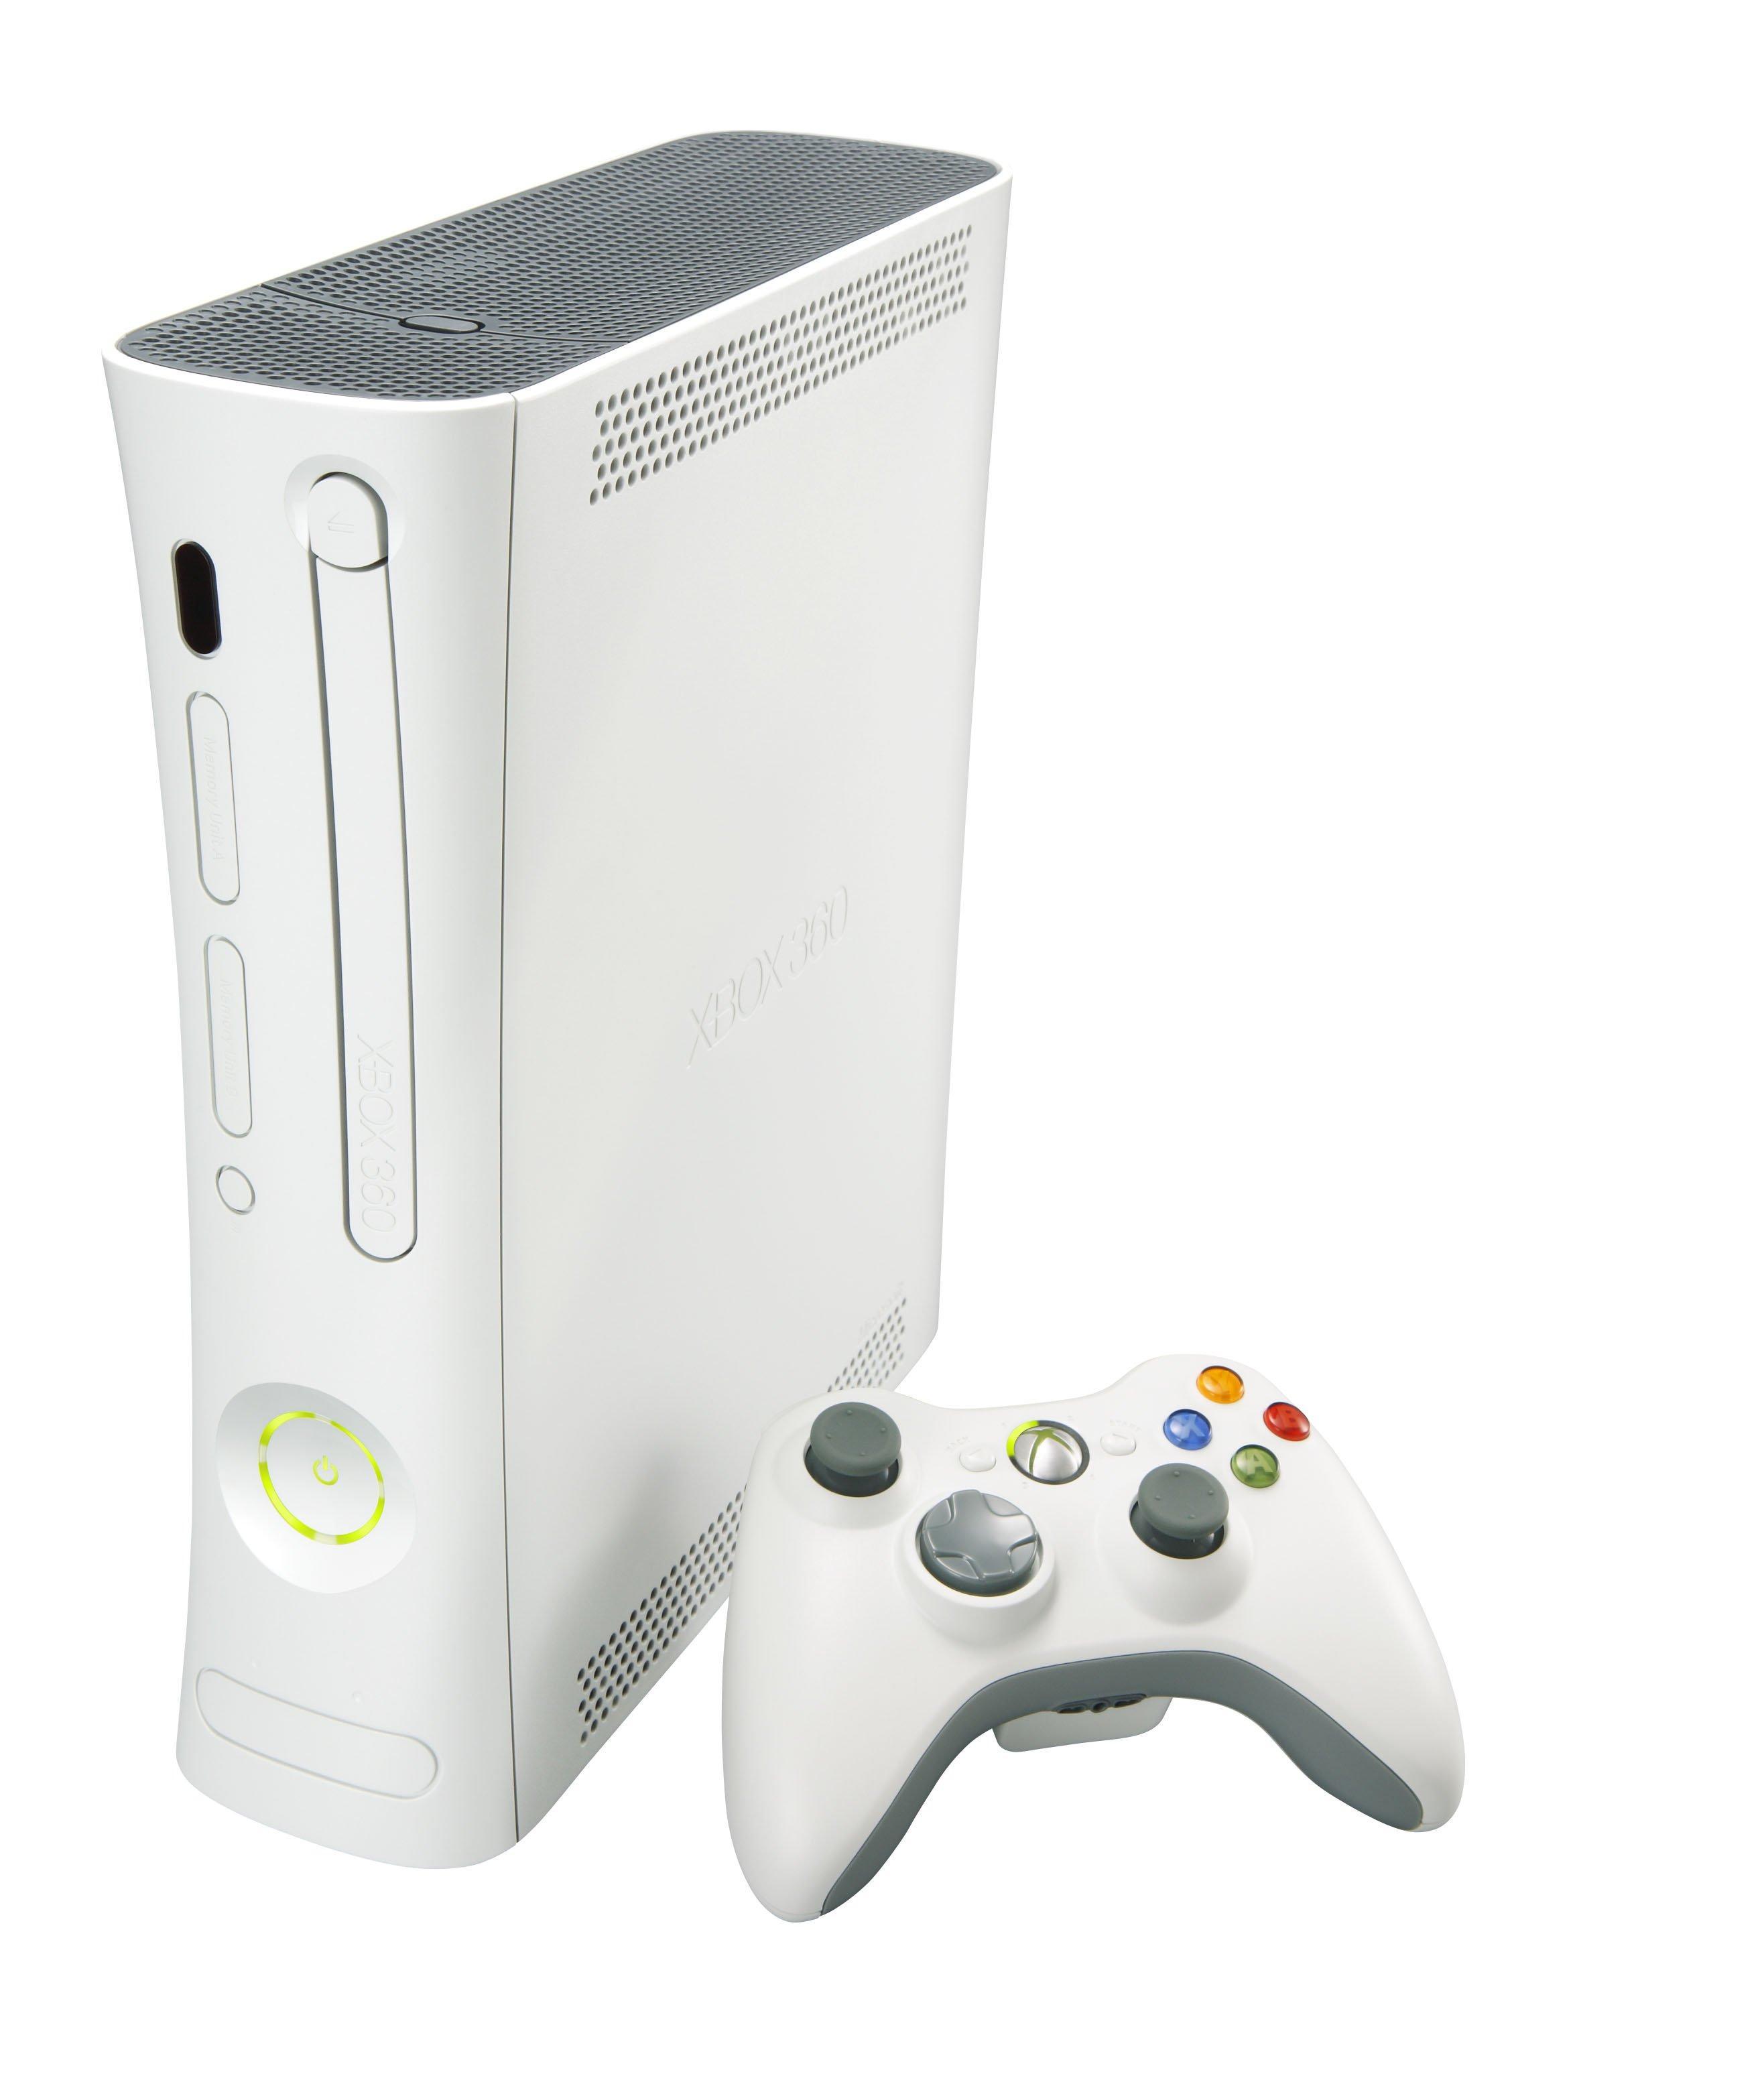 Xbox 360 System - White with Wireless Controller (GameStop Premium  Refurbished) | Xbox 360 | GameStop